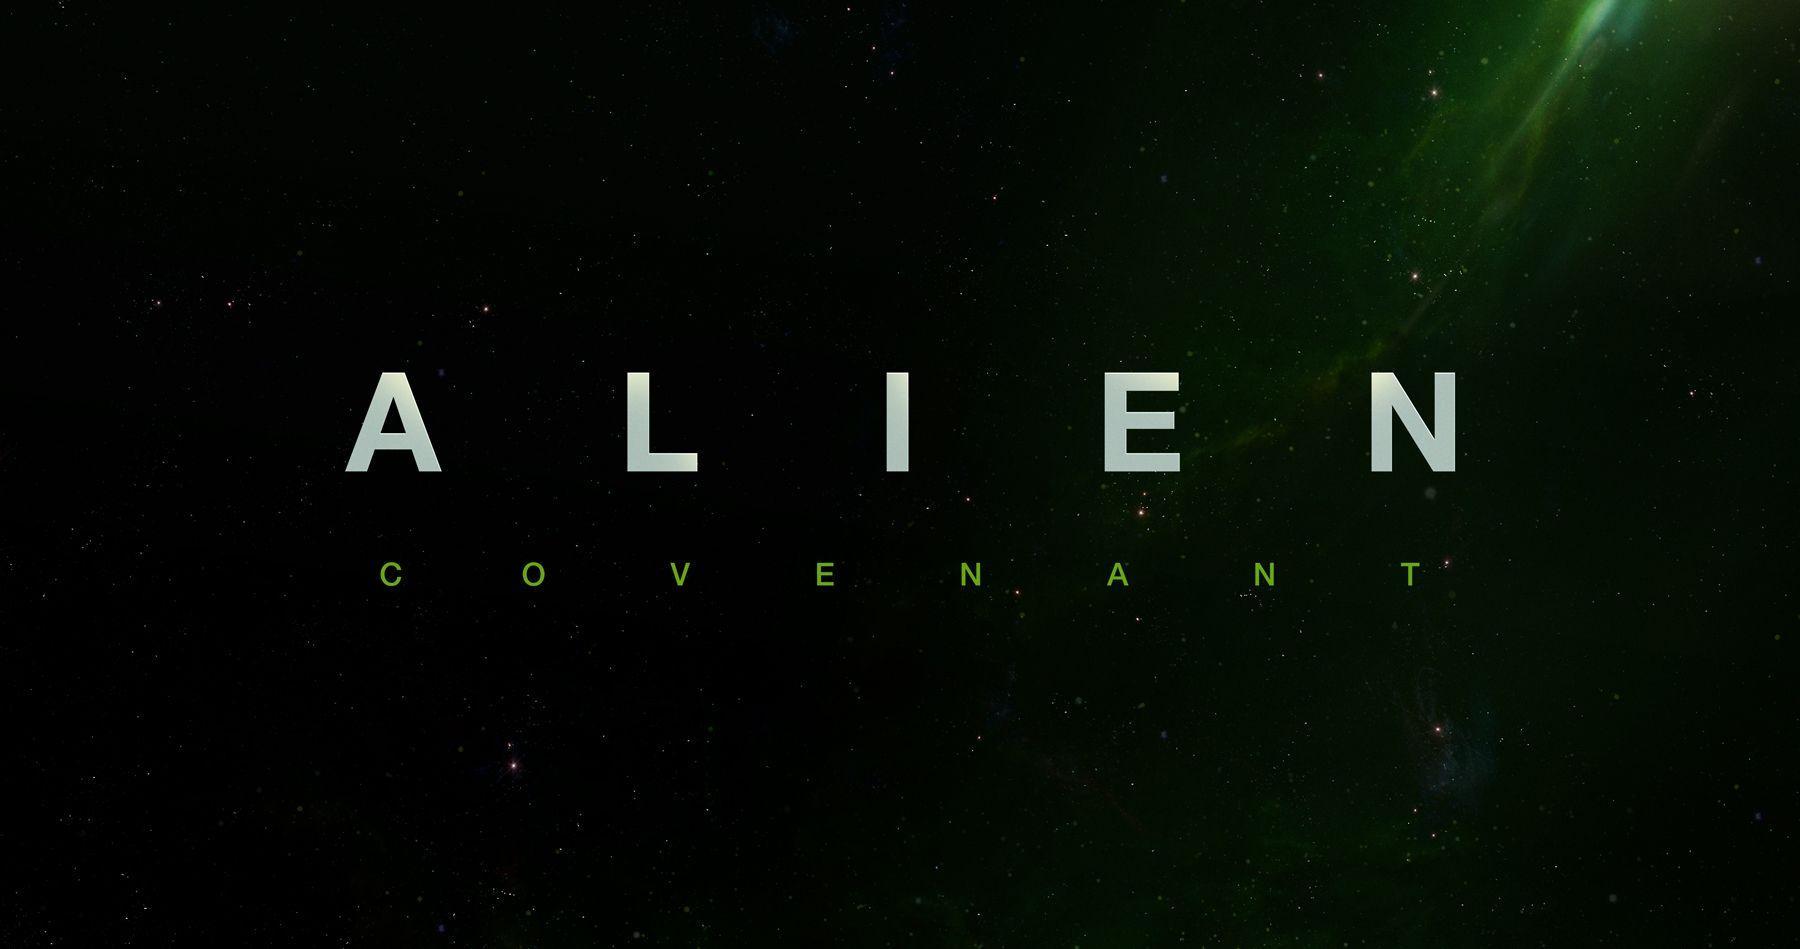 Alien Movie Wallpapers Top Free Alien Movie Backgrounds Wallpaperaccess